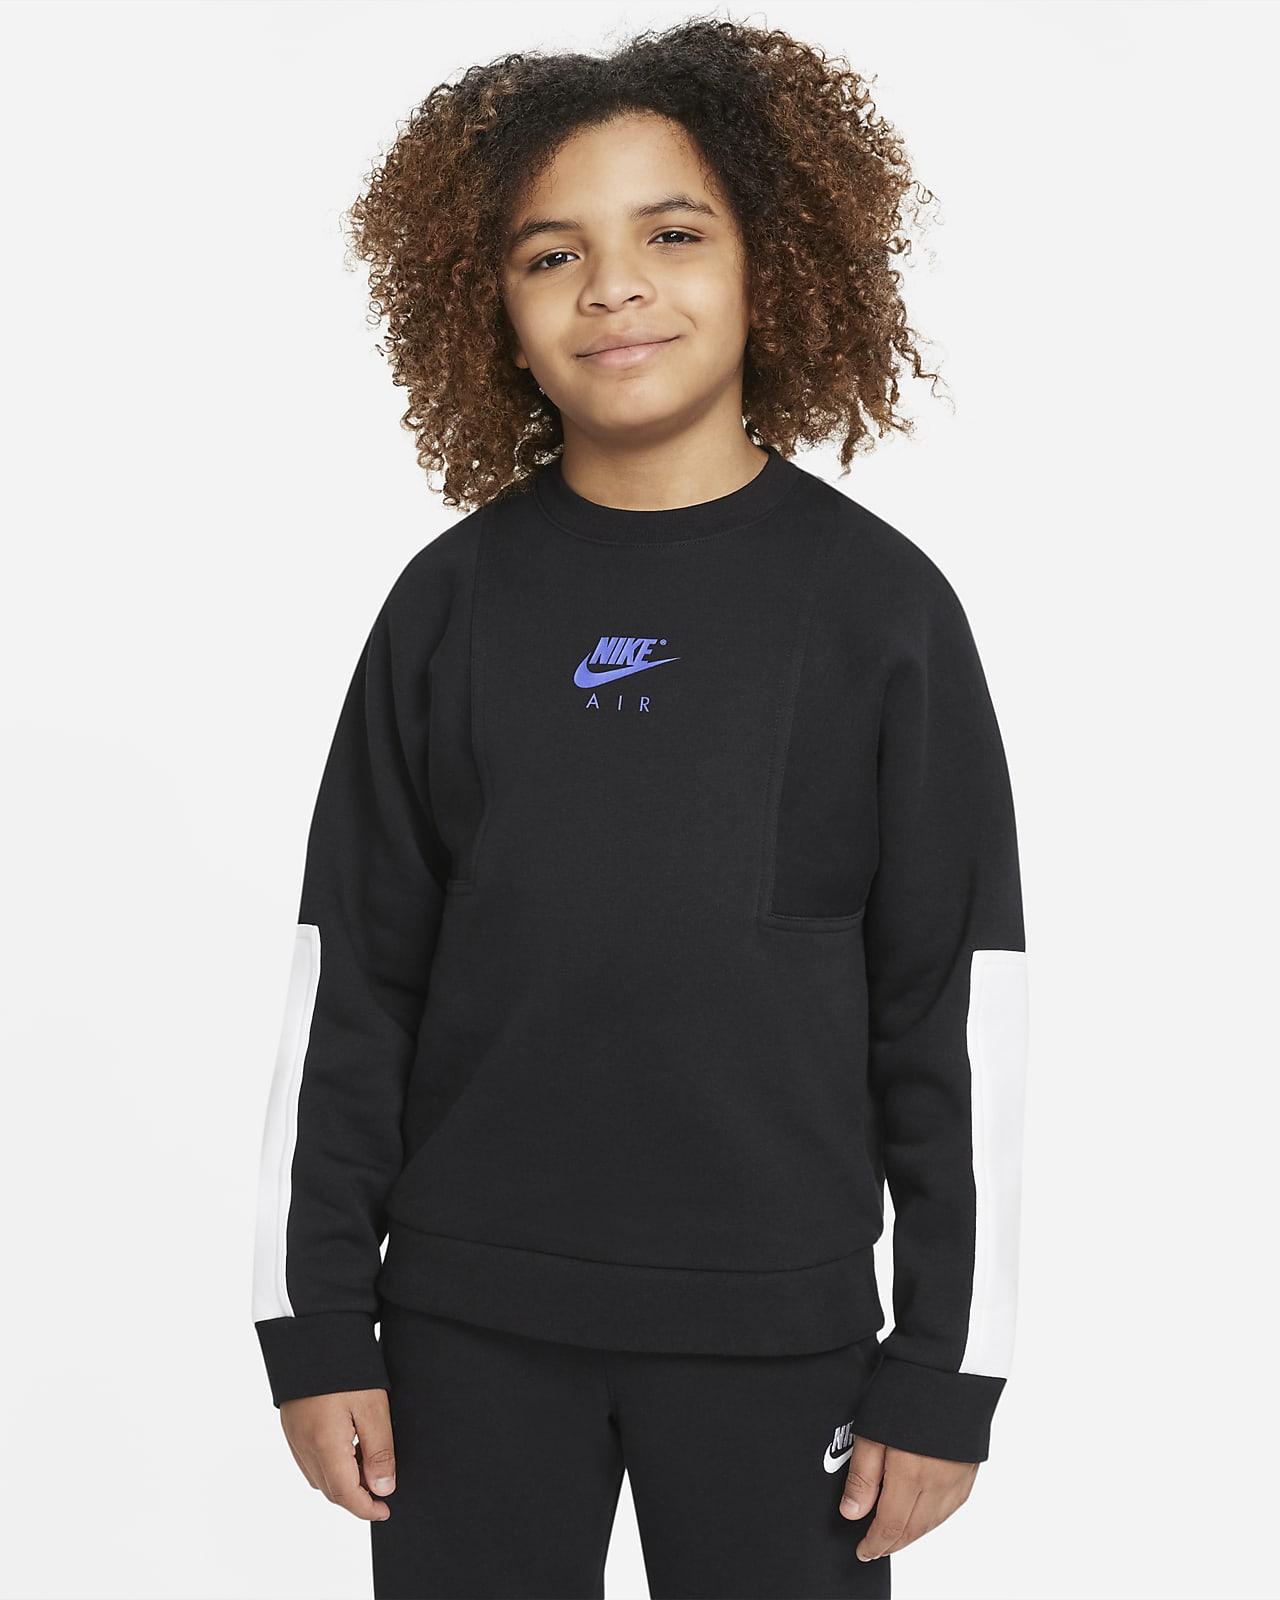 Sweat-shirt Nike Air pour Garçon plus âgé